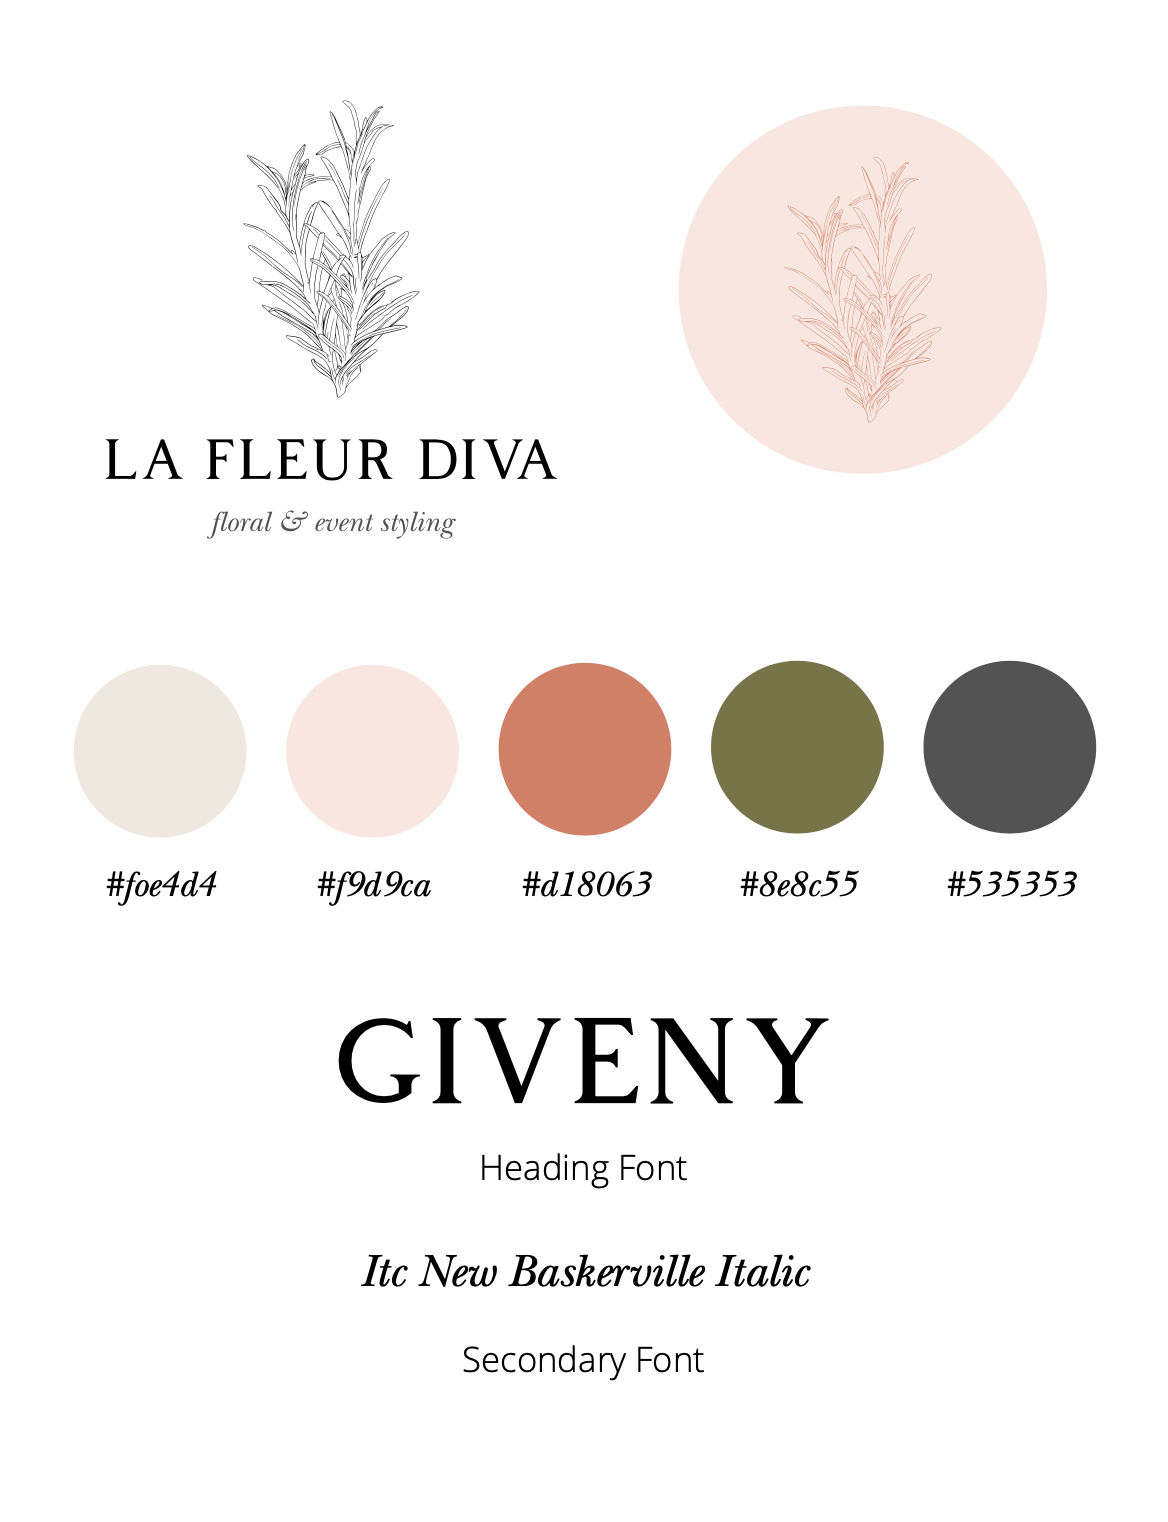 La Fleur Diva Branding Style Guide